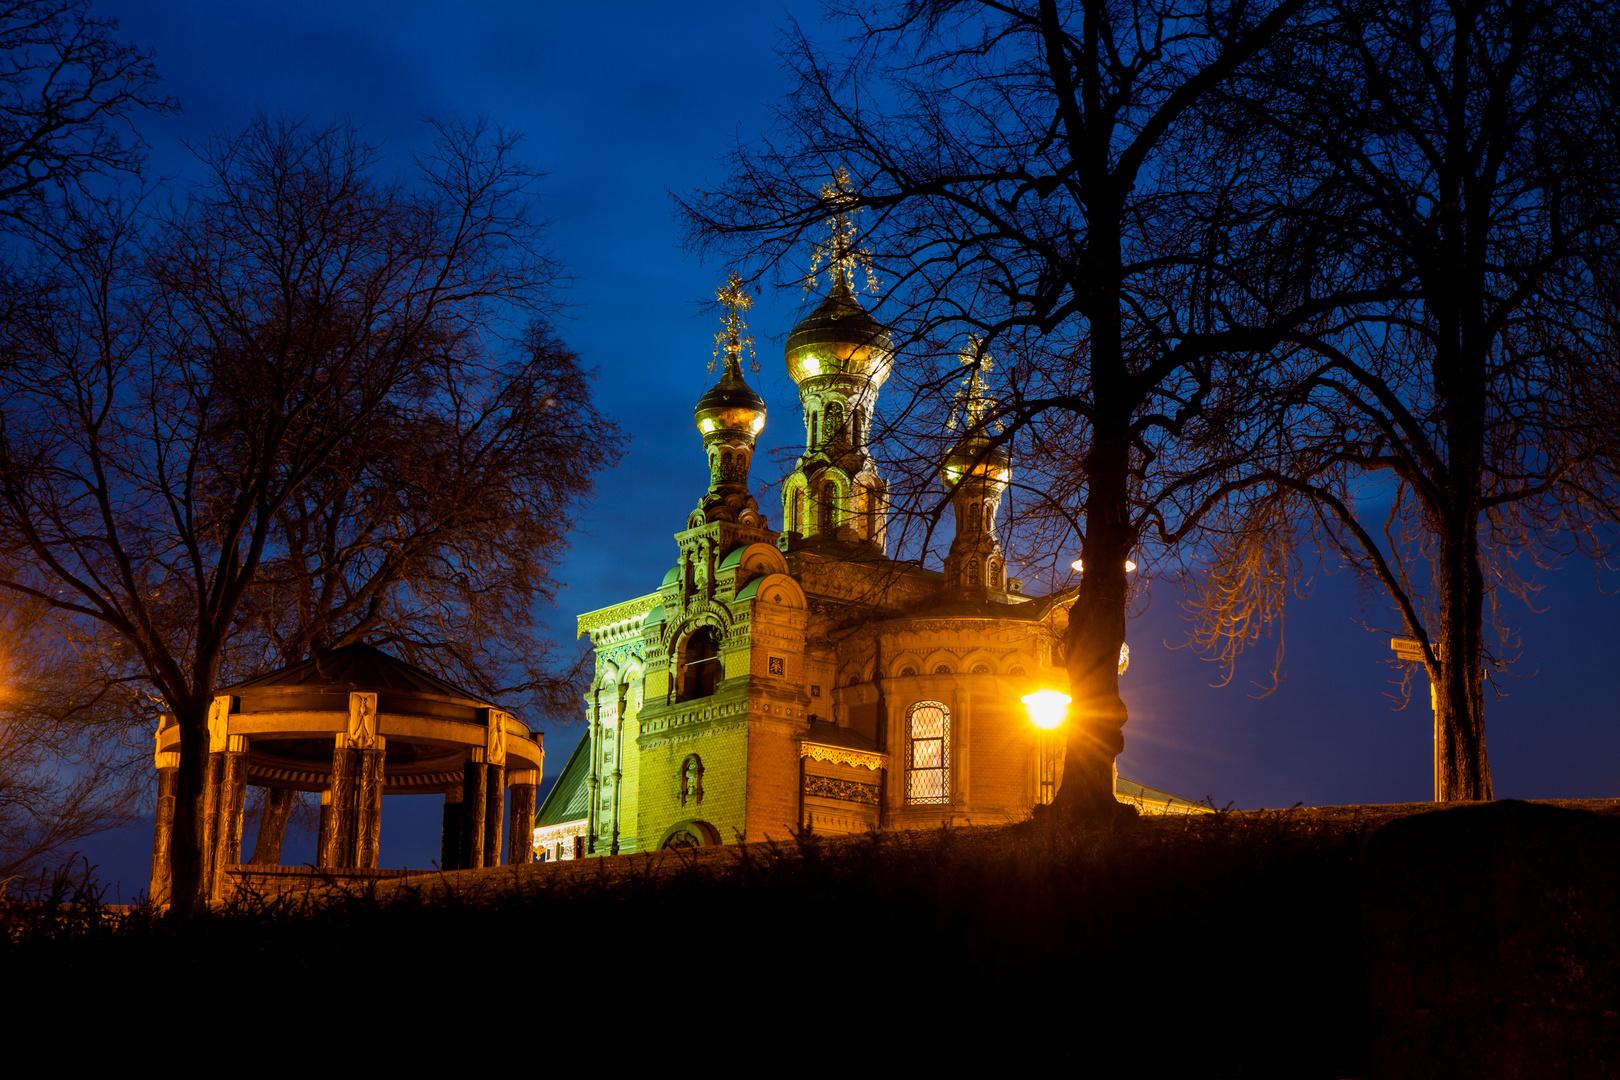 Russische Kapelle, Darmstadt Mathildenhöhe